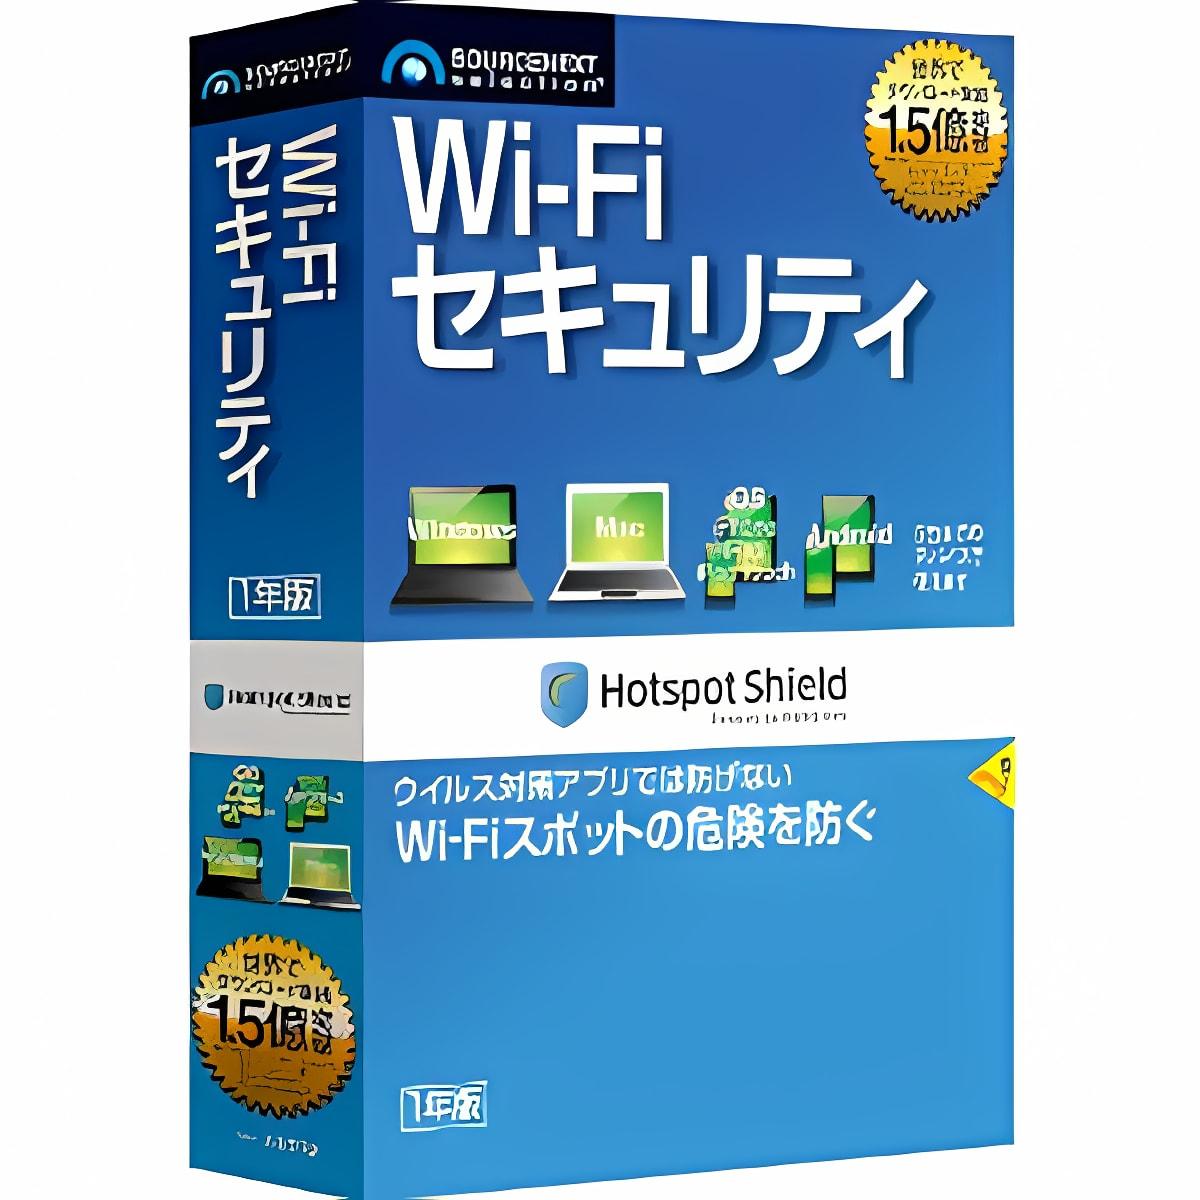 Wi-Fi セキュリティ 不明